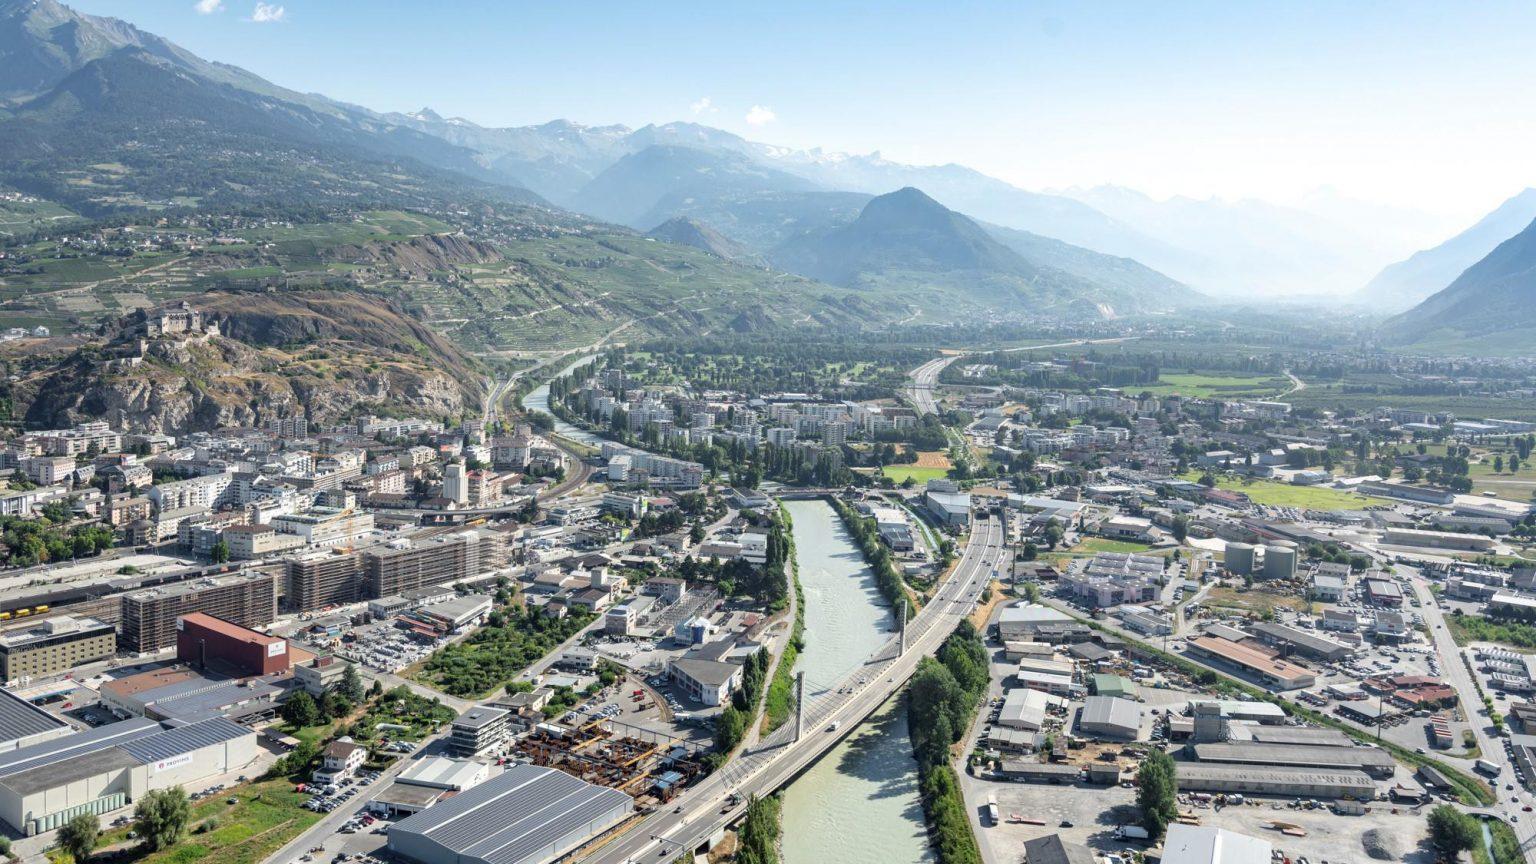 © 2018 EPFL-LAST | Nicolas Sedlatchek